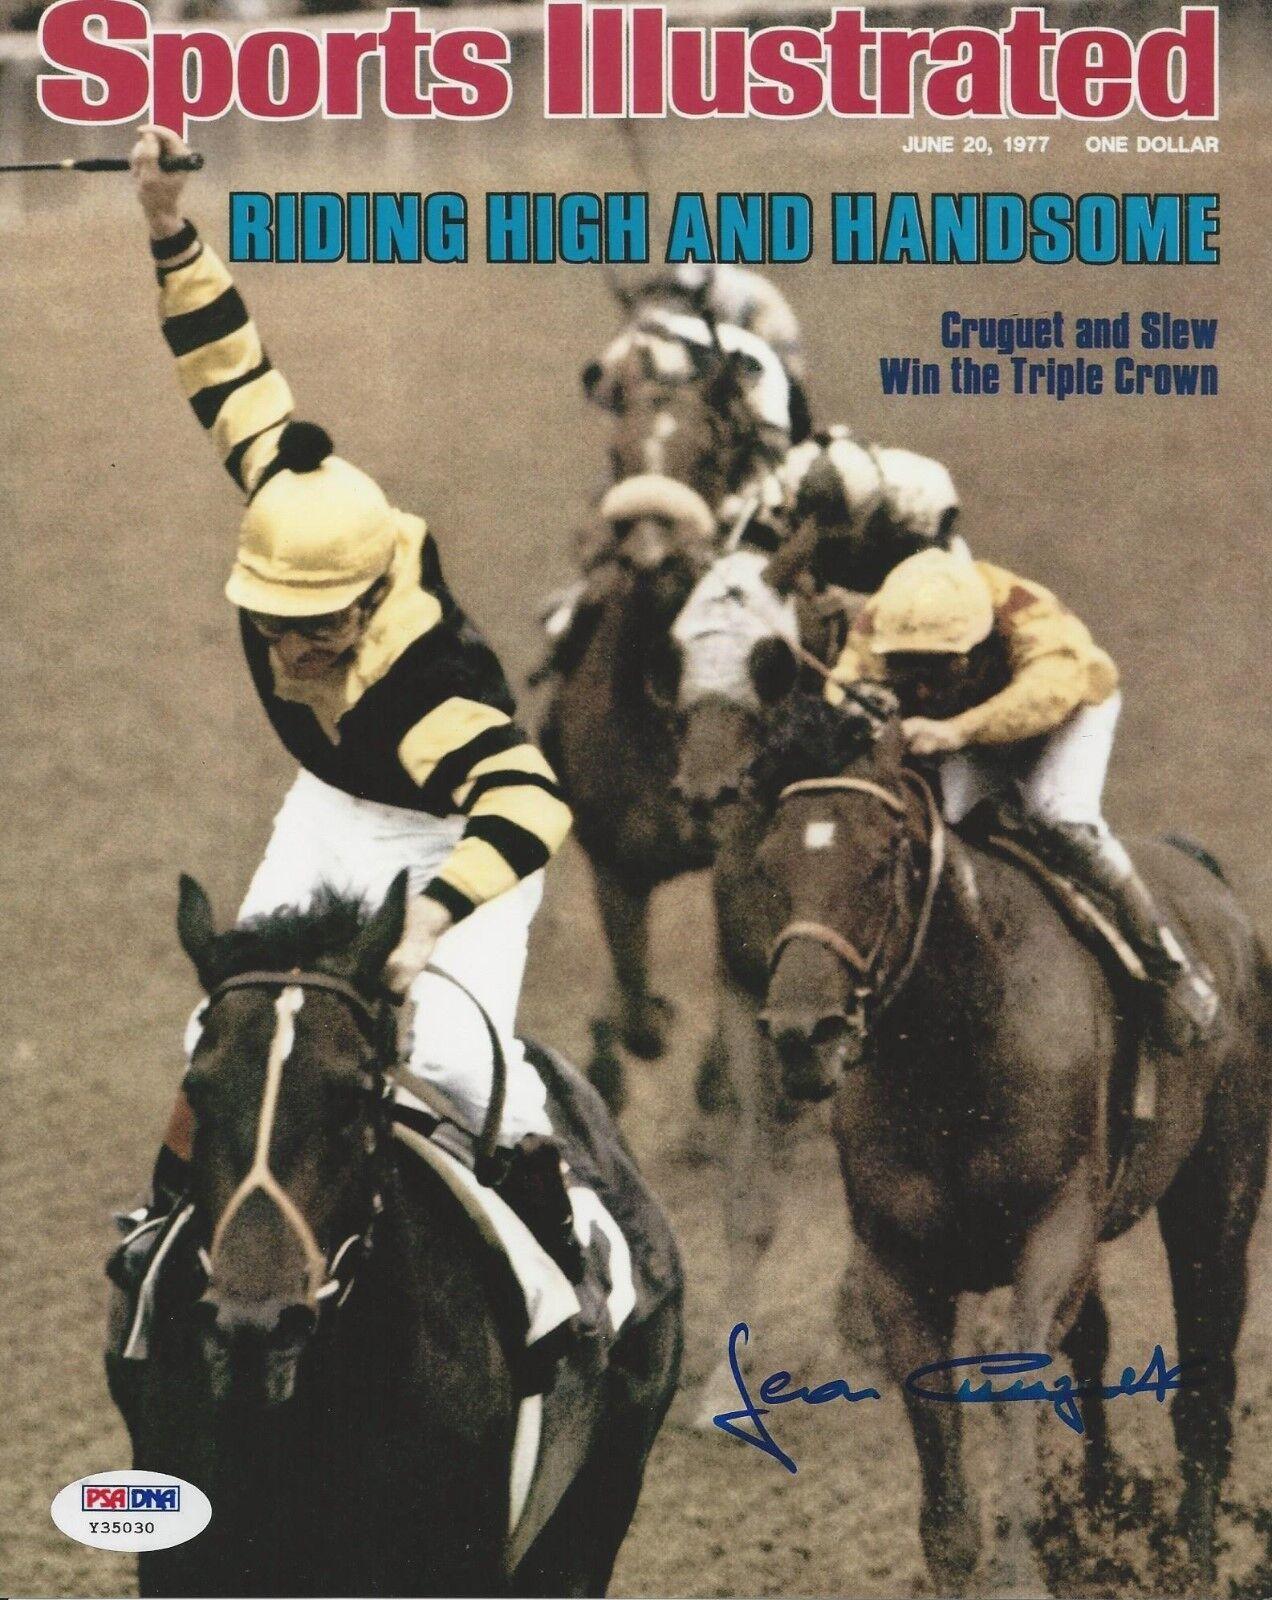 Jean Cruguet Horse Racing Jockey Signed 8x10 Photo - PSA/DNA # Y35030